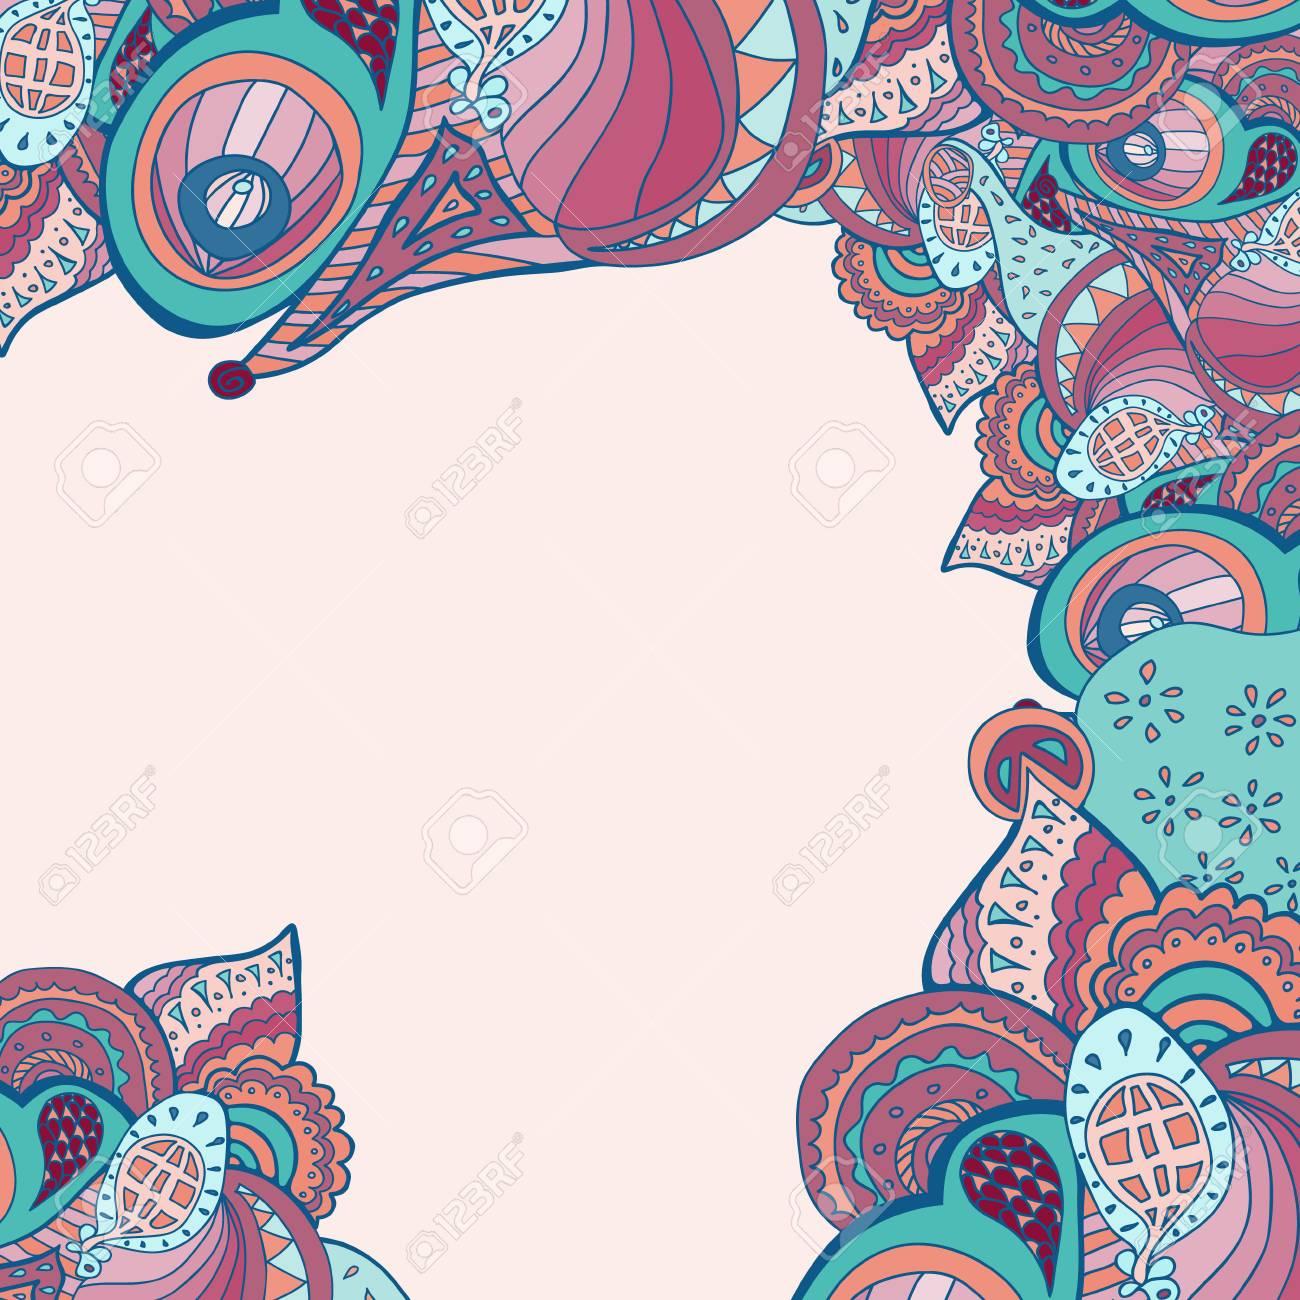 Vector Border Illustration Decorative Element Border For Invitation